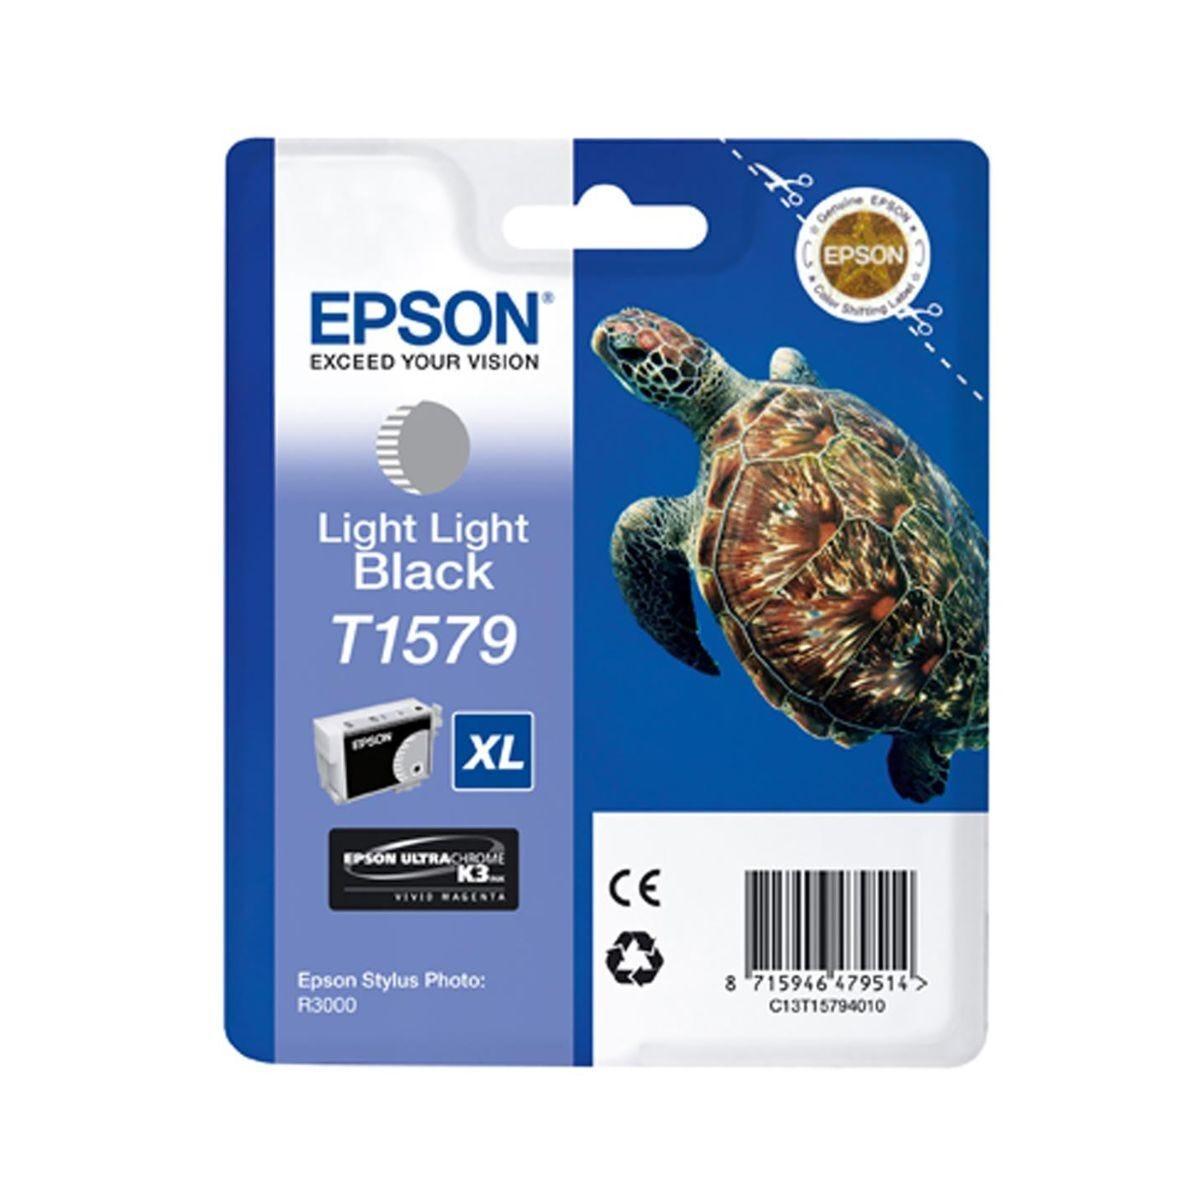 Epson R3000 Light Light Black Ink Cartridge